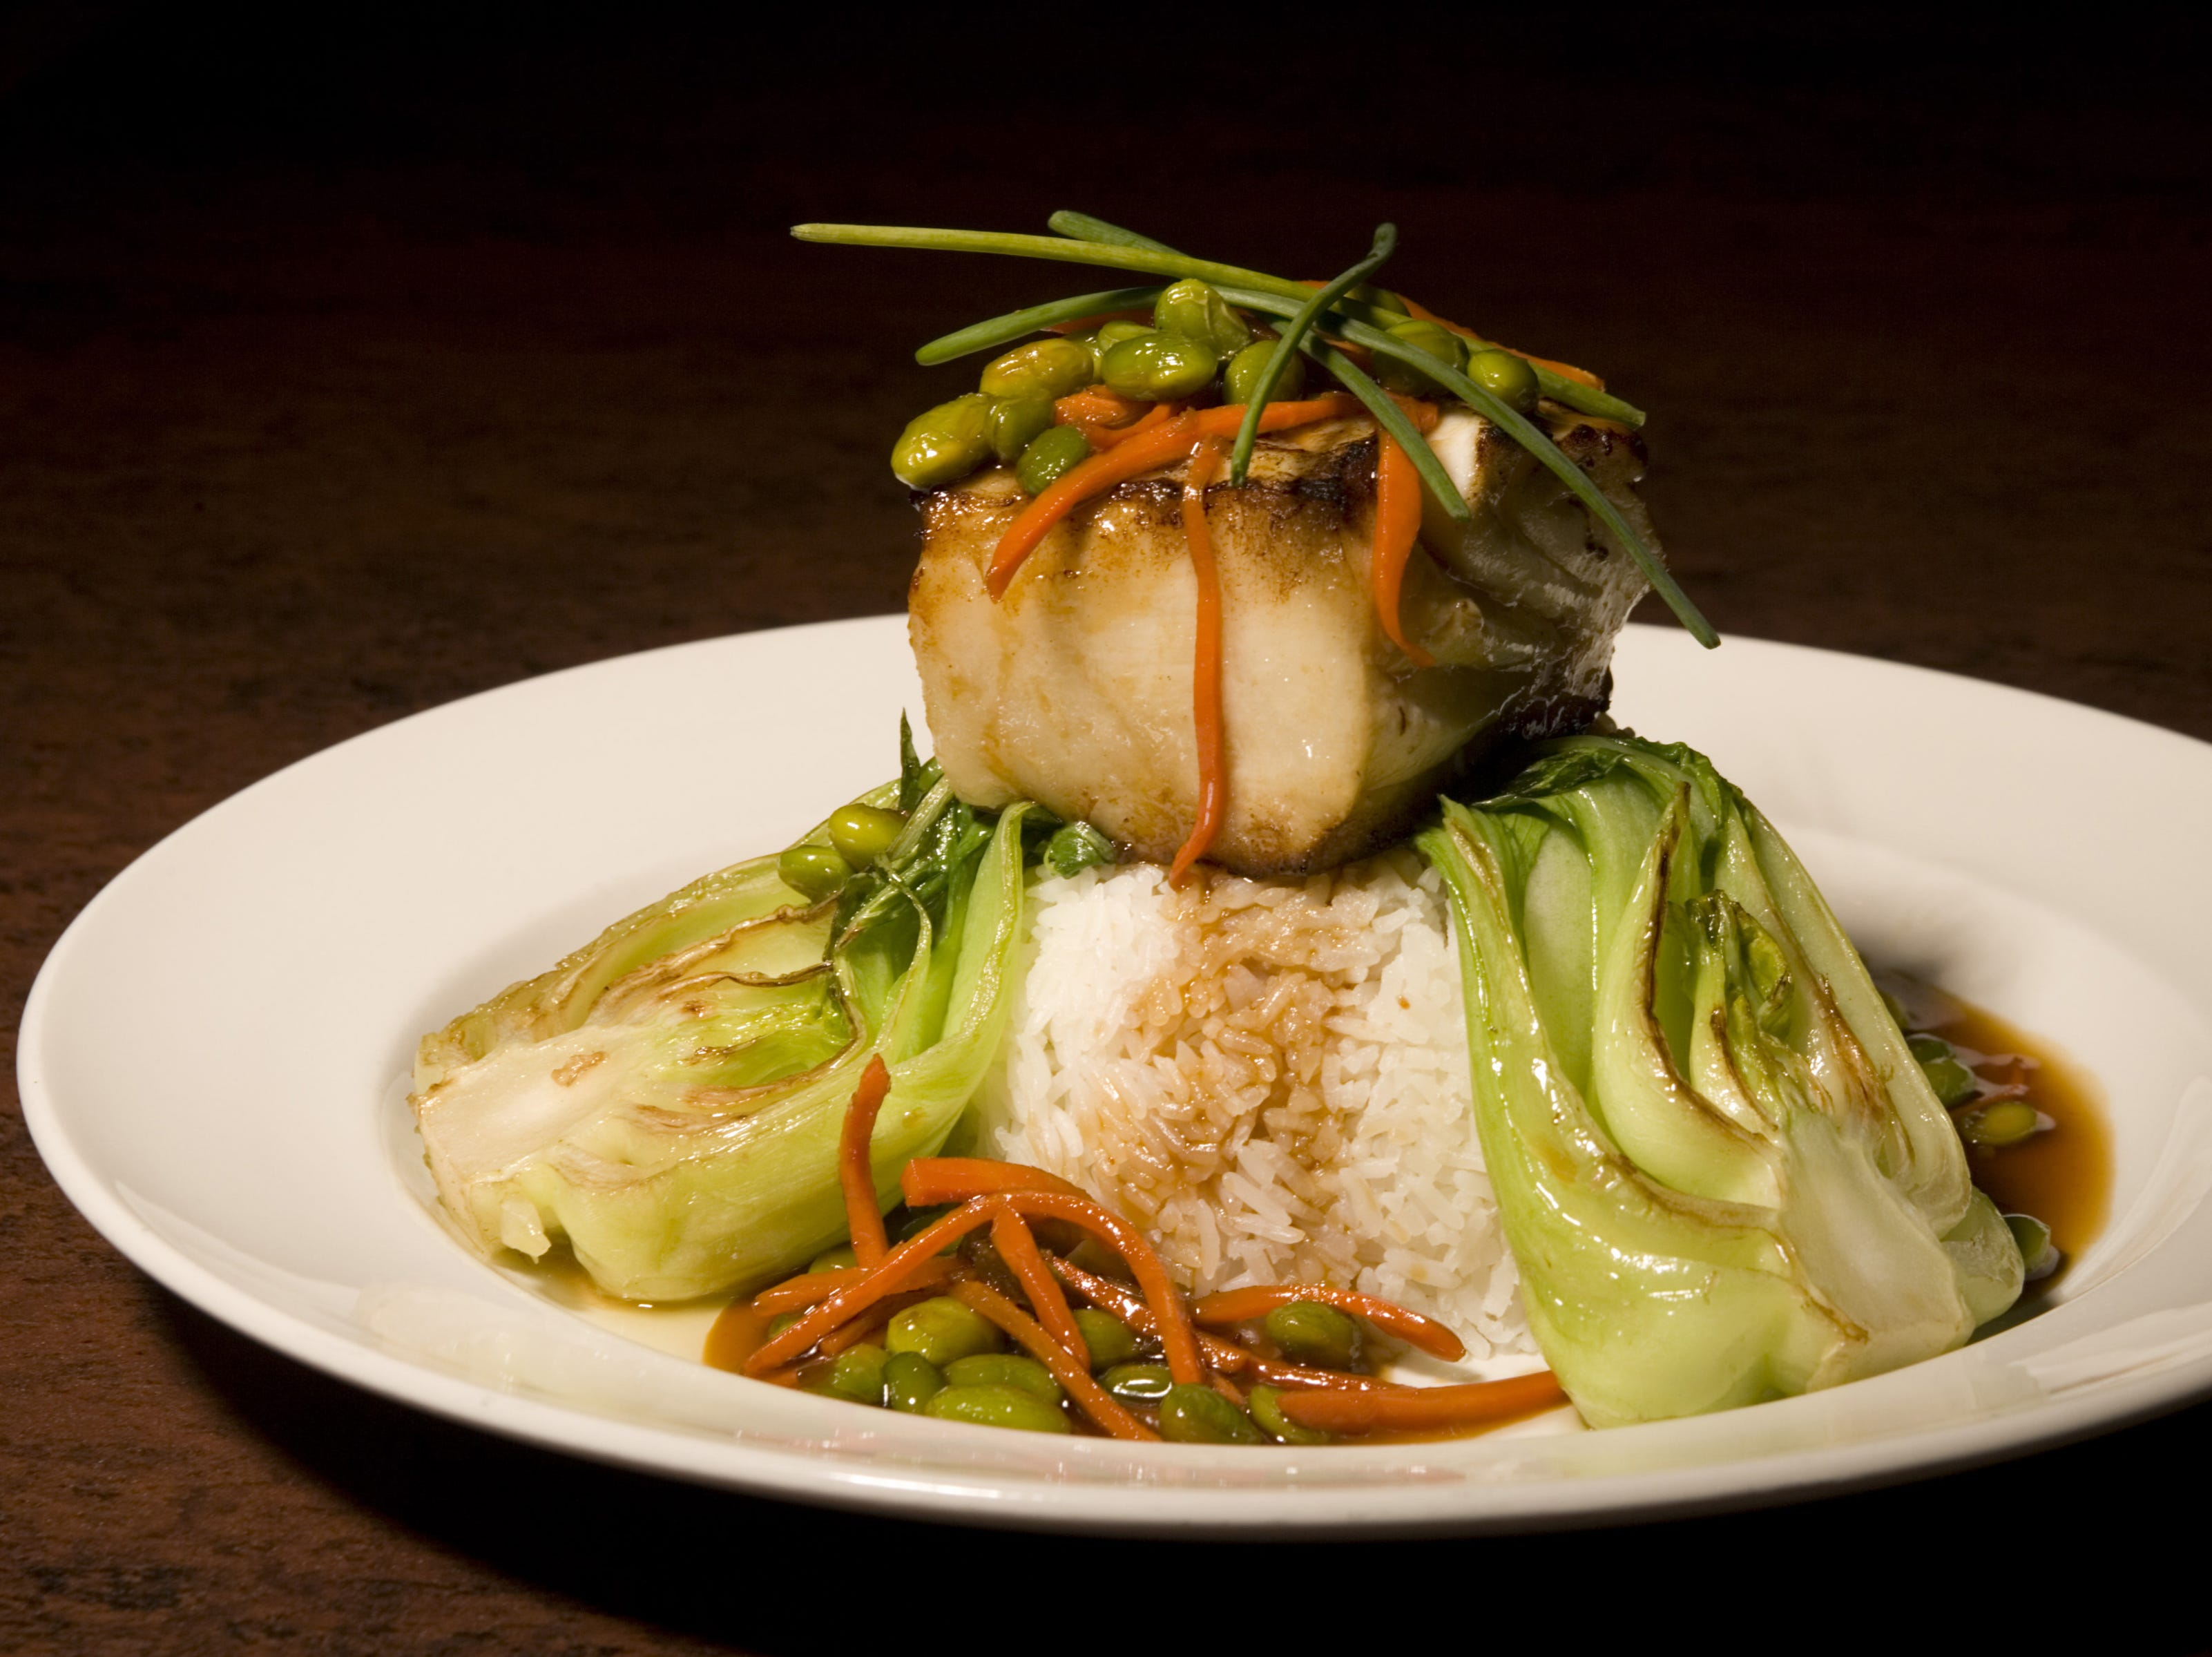 Miso Glazed Sea Bass with bok choy, carrots, edamame and jasmine rice at Yard House.